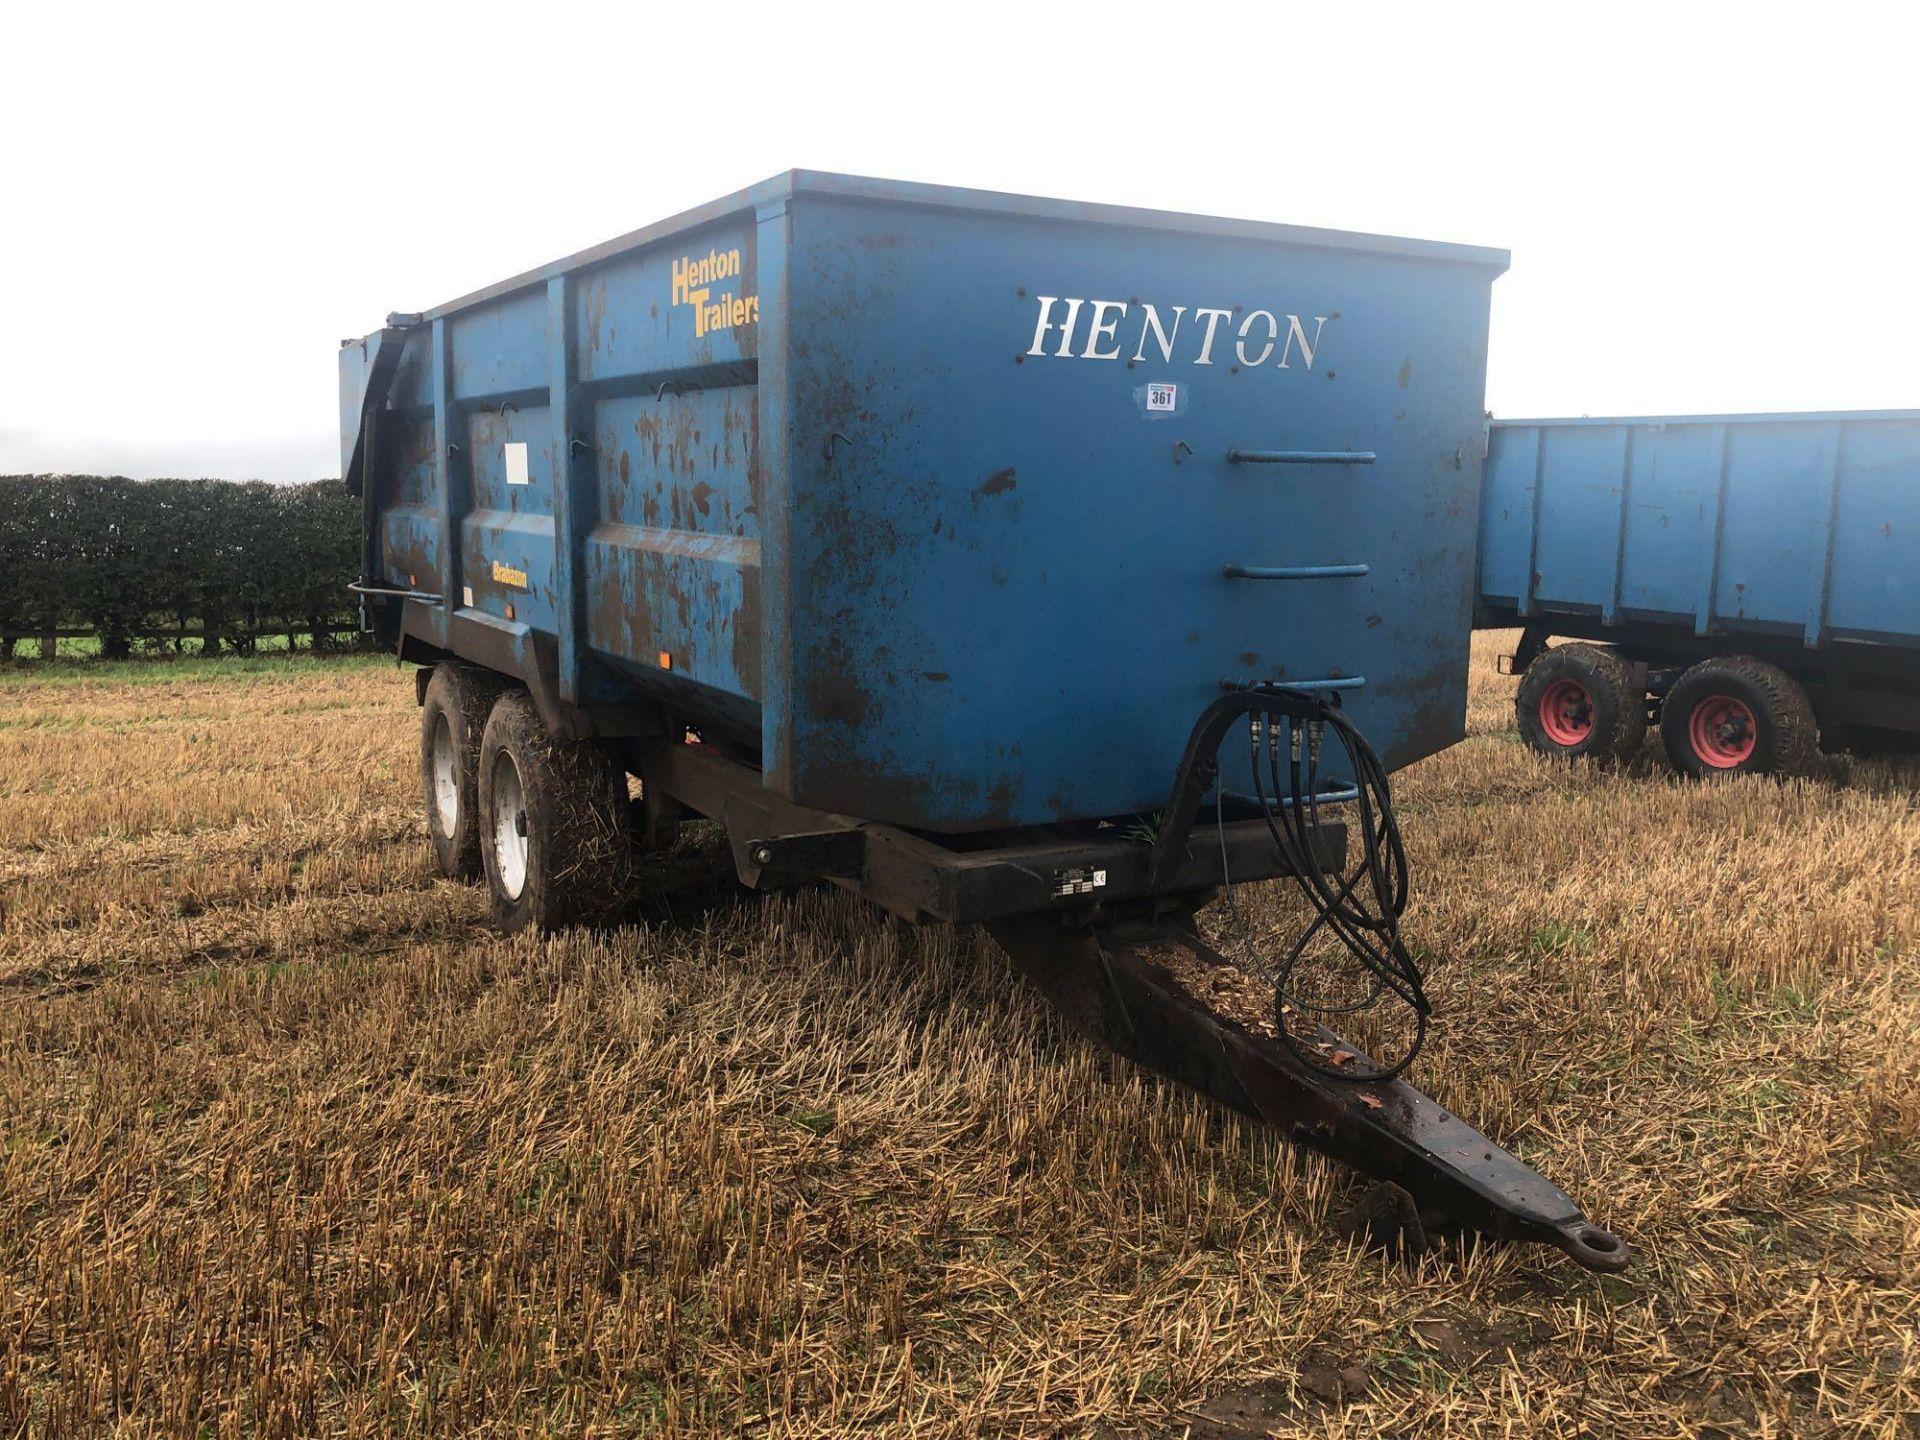 AA Henton & Son 12t twin axle trailer, hydraulic rear door, manual grain chute, sprung draw bar on 3